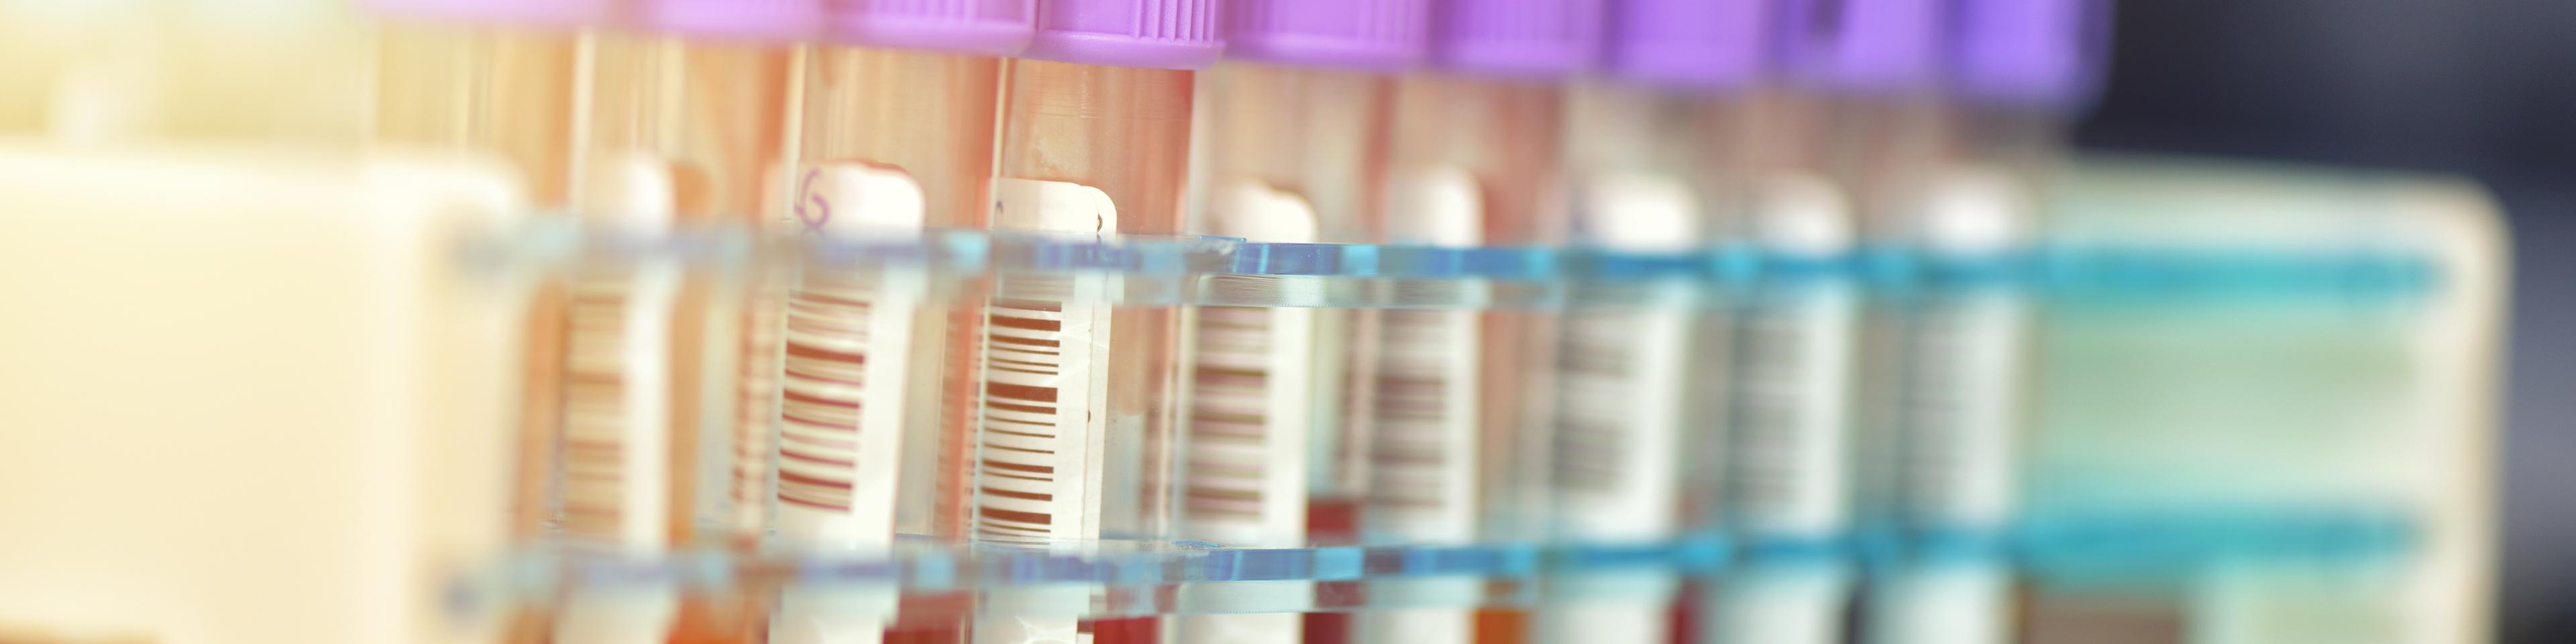 Tubes of blood samples for testing, medical equipment